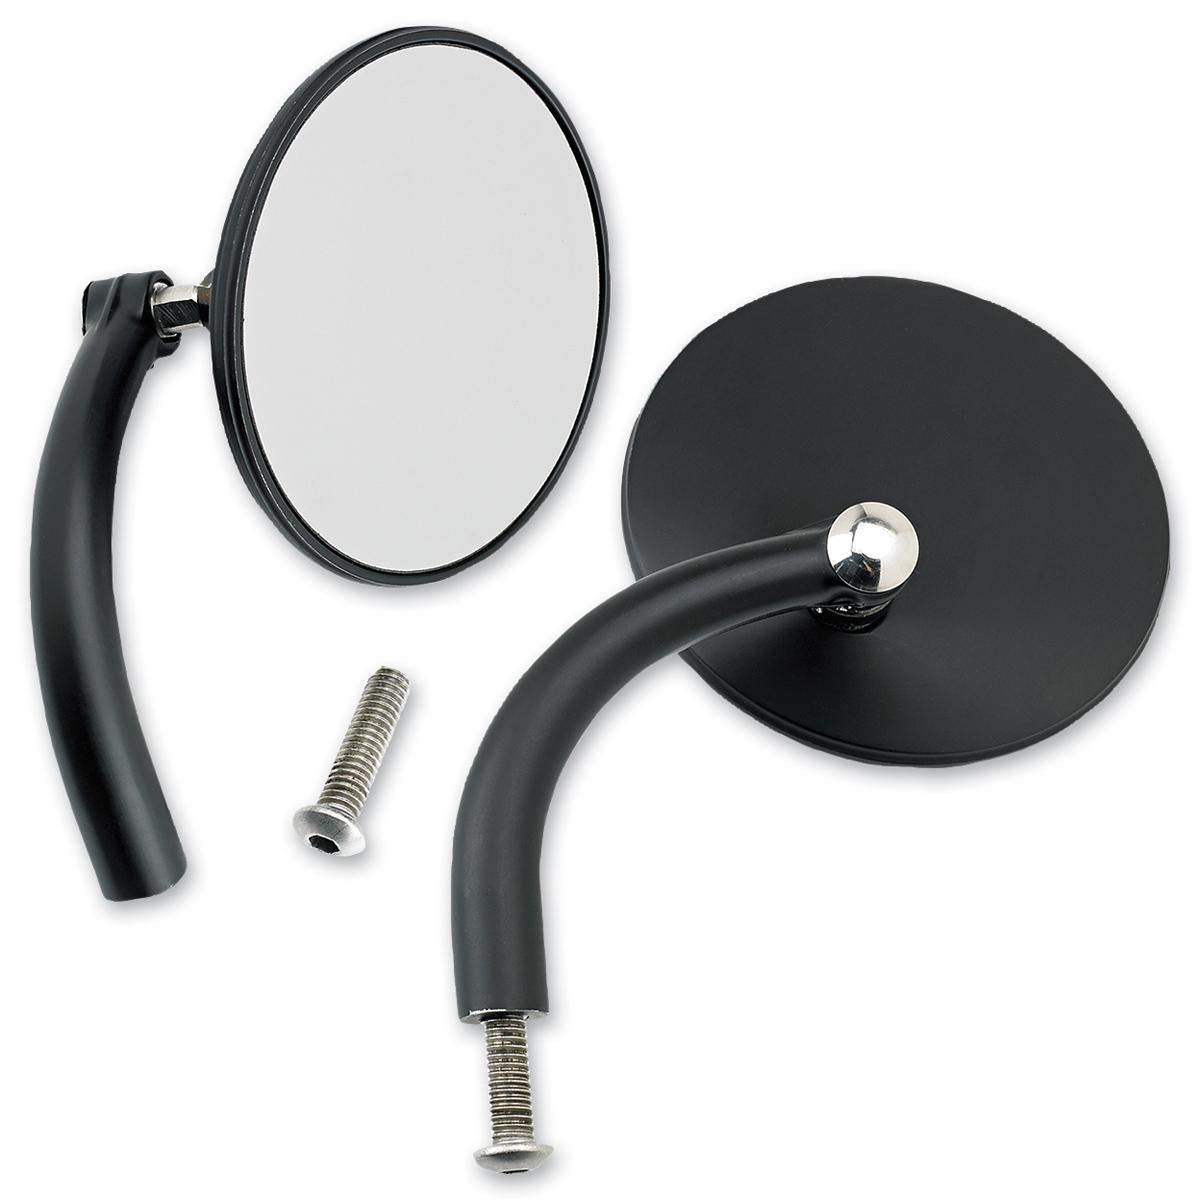 Biltwell Inc. Black Round Utility Mirror Set